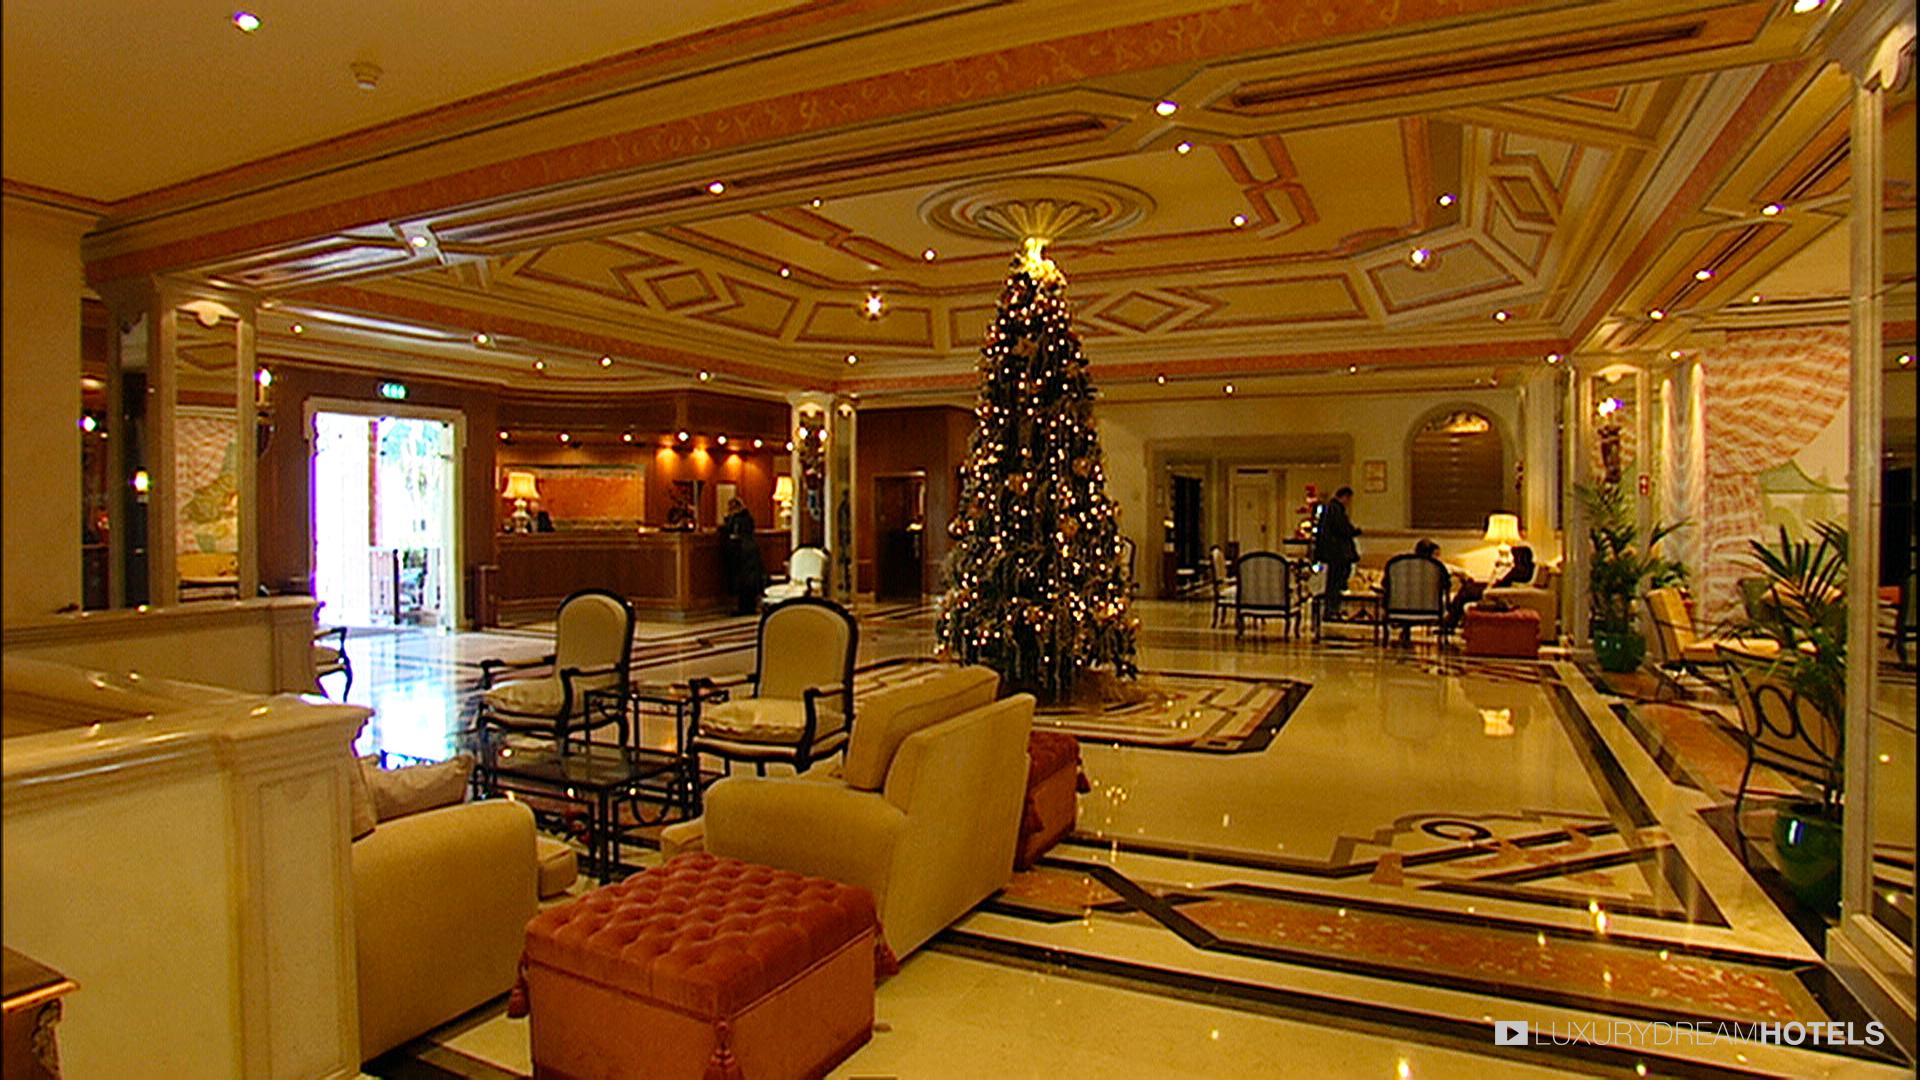 Royal palace interior design luxury palace interior design in the uae spazio royal palace of - Interior designer caserta ...